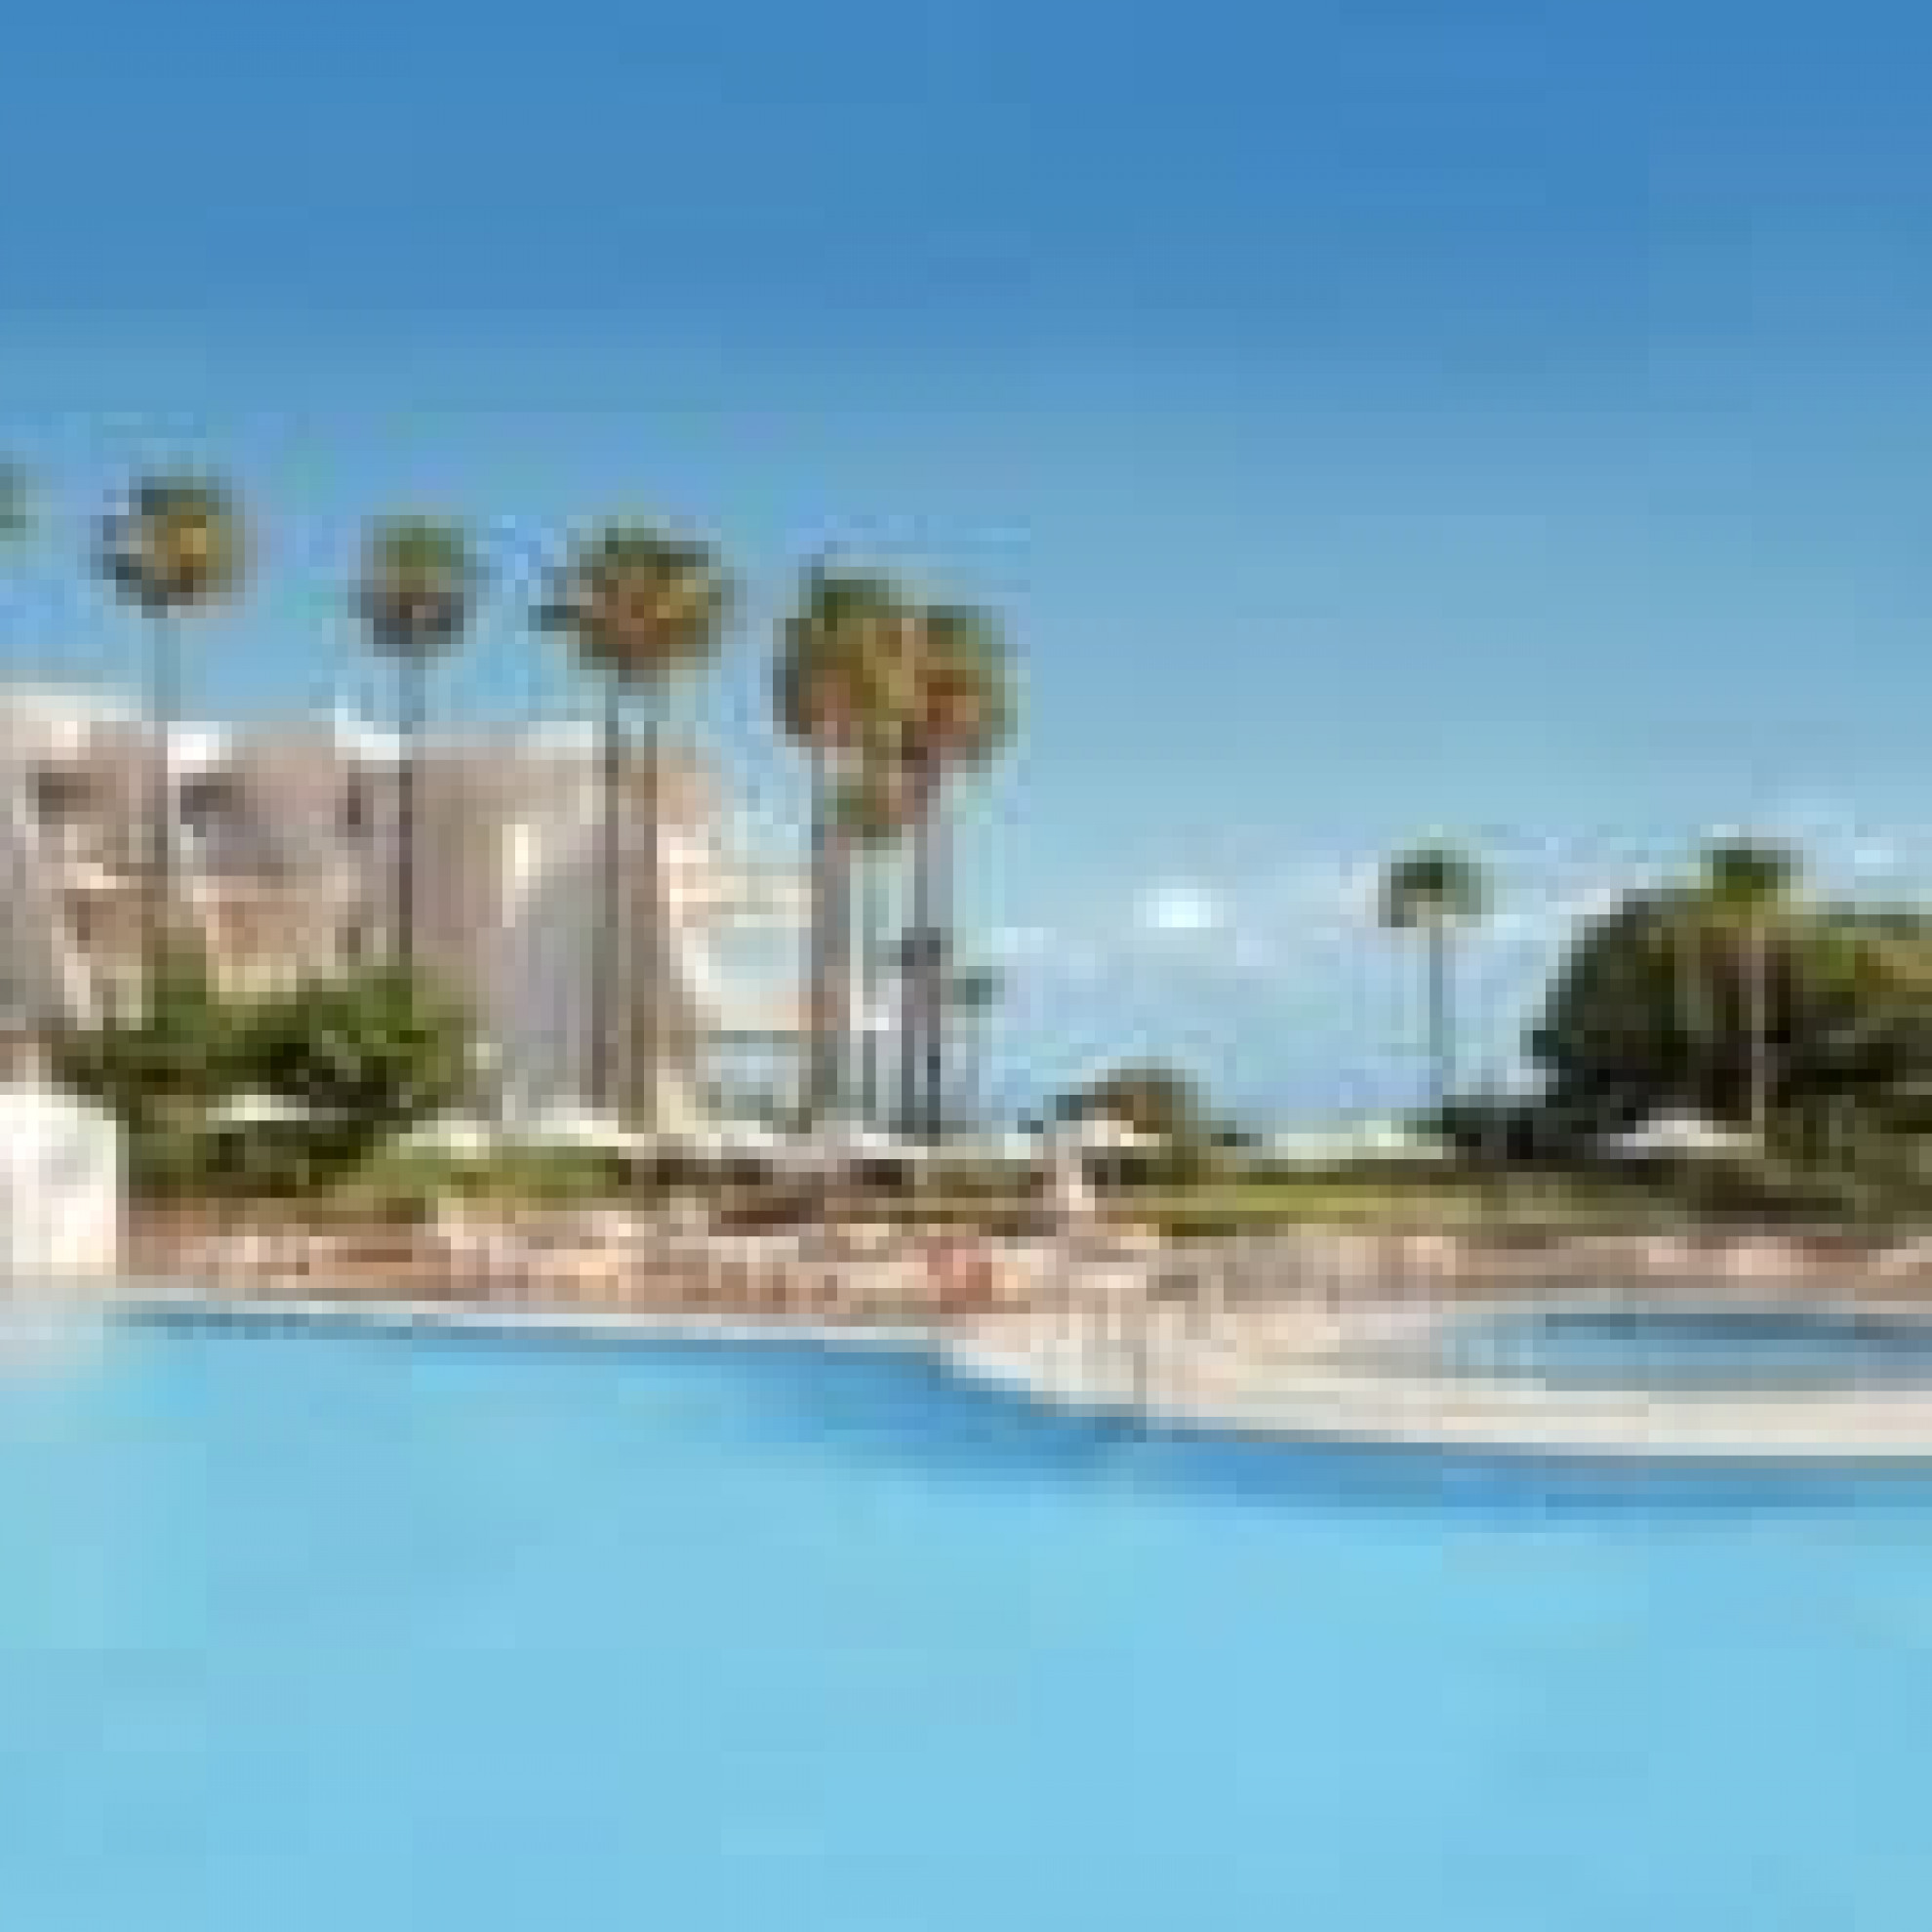 Hotel Iberostar Royal Andalus Novo Sancti Petri Green Golf